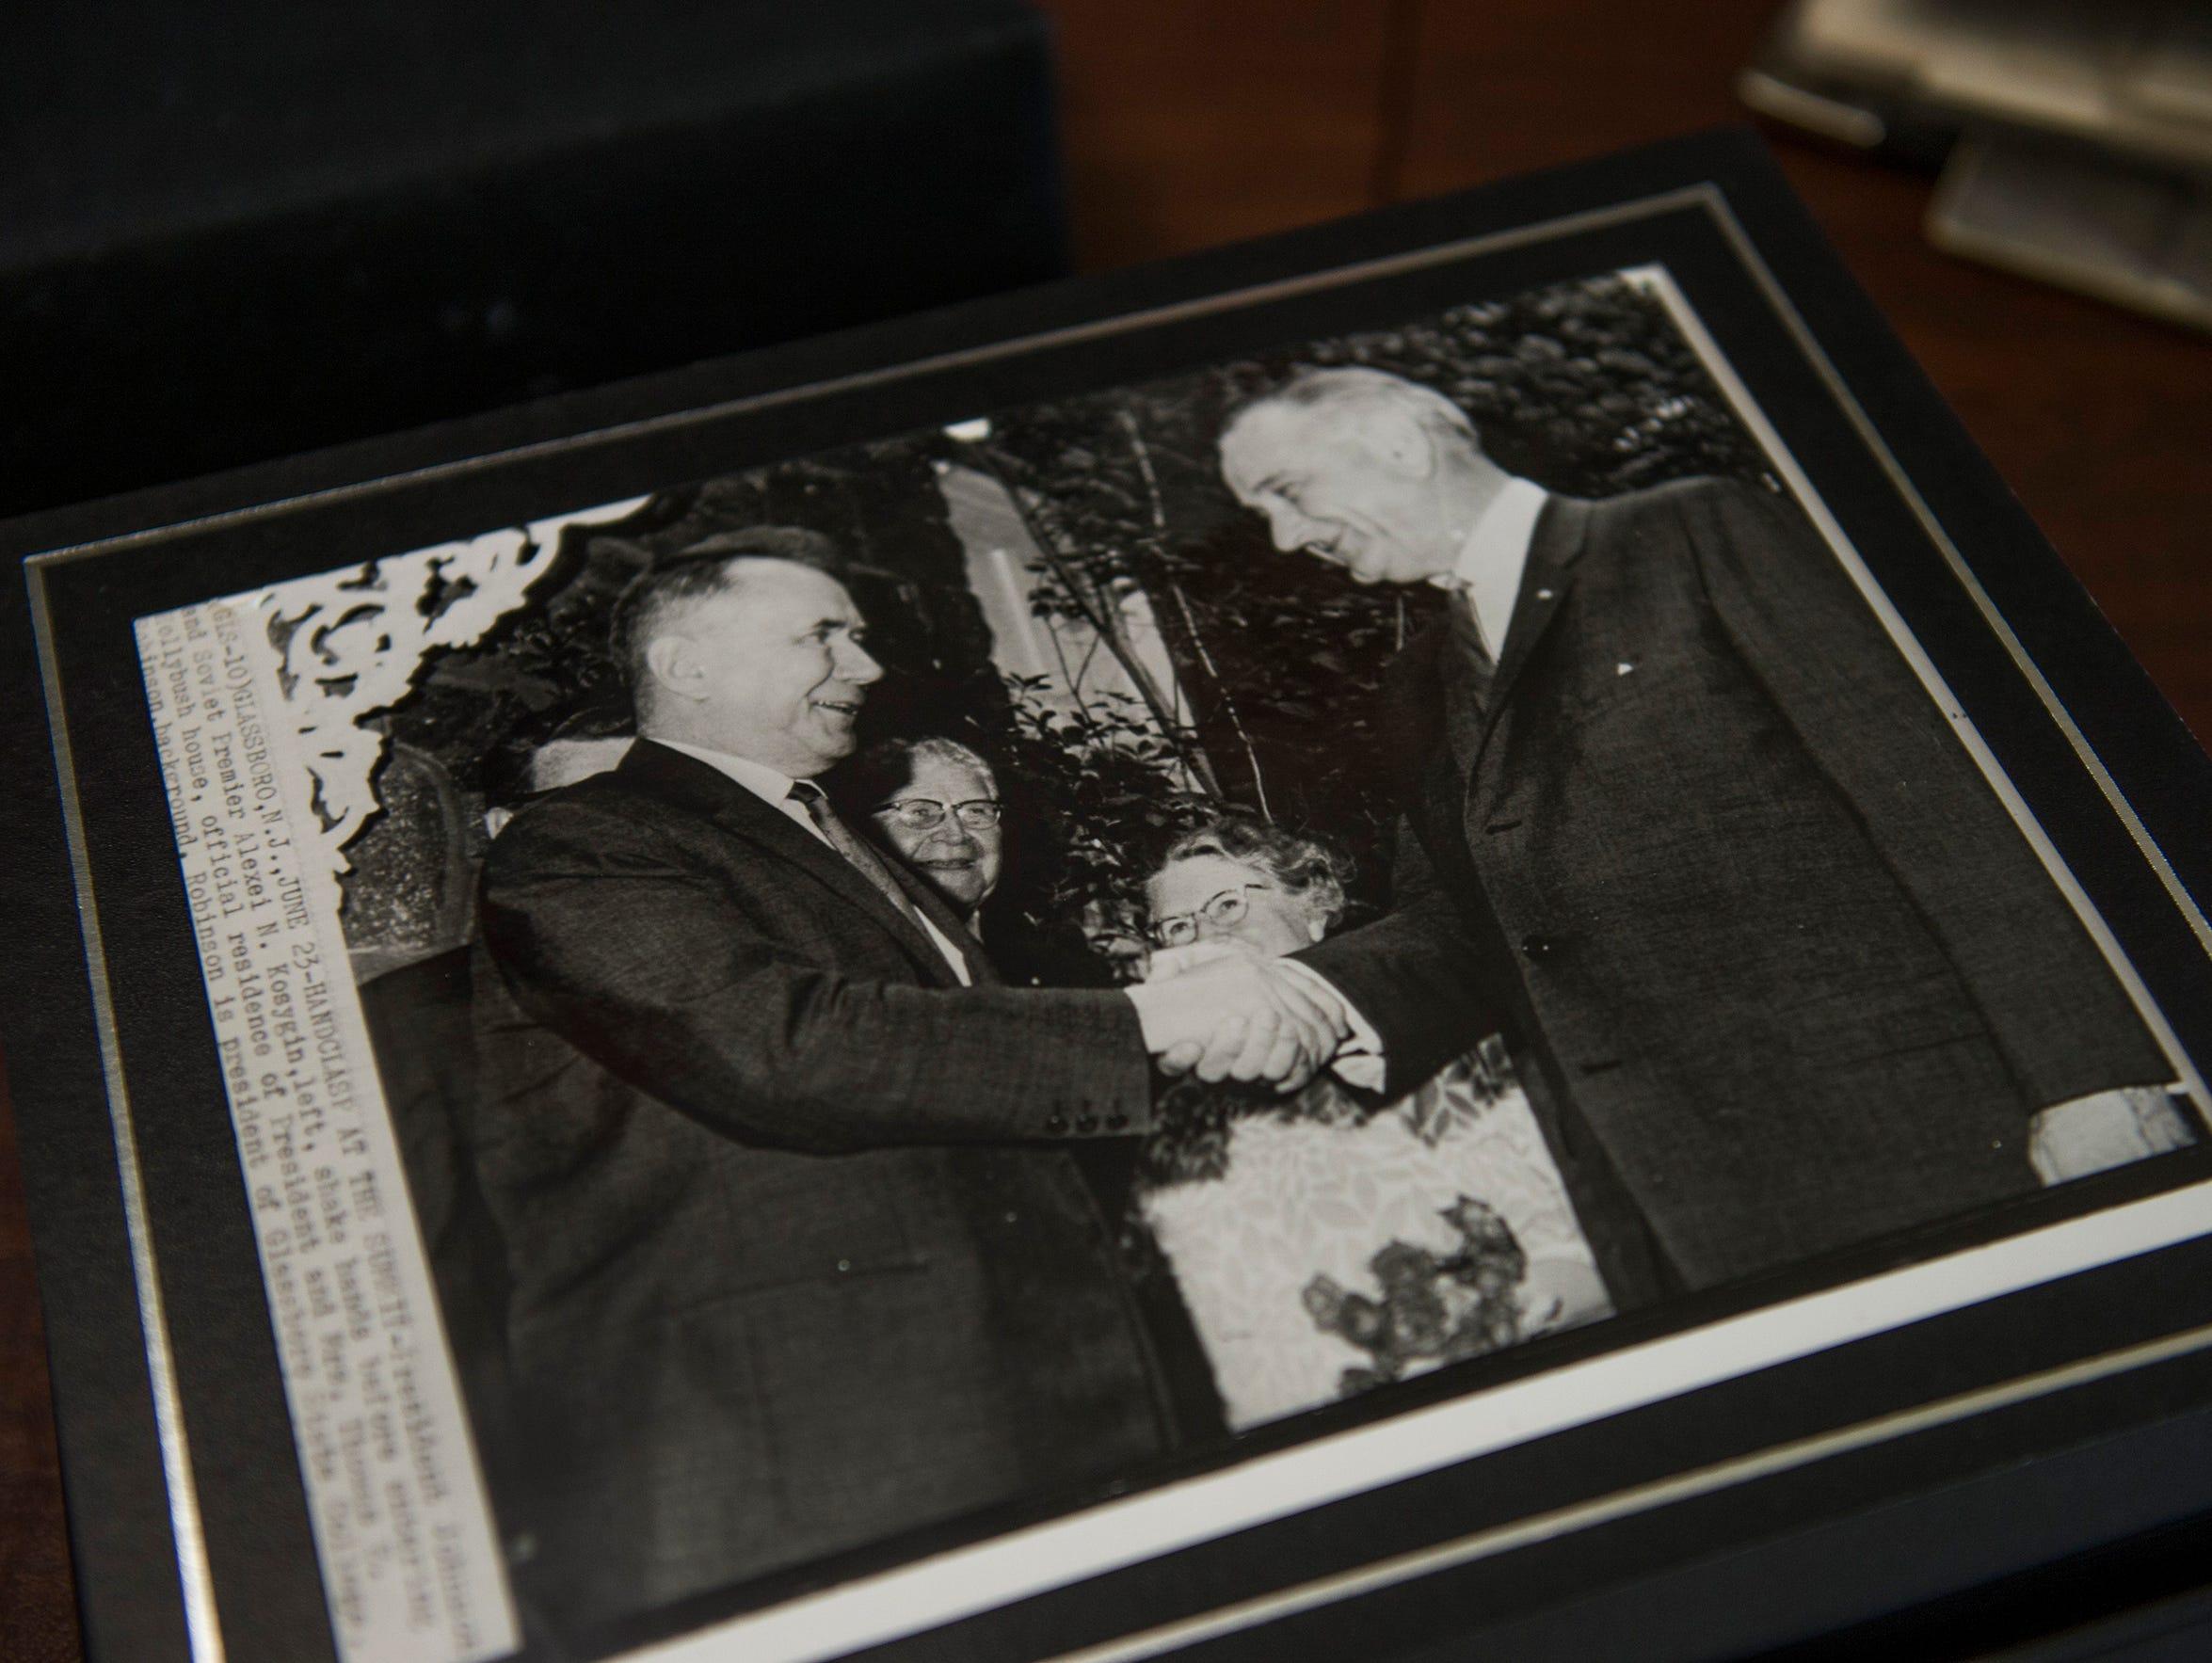 An Associated Press photo of President Lyndon B. Johnson